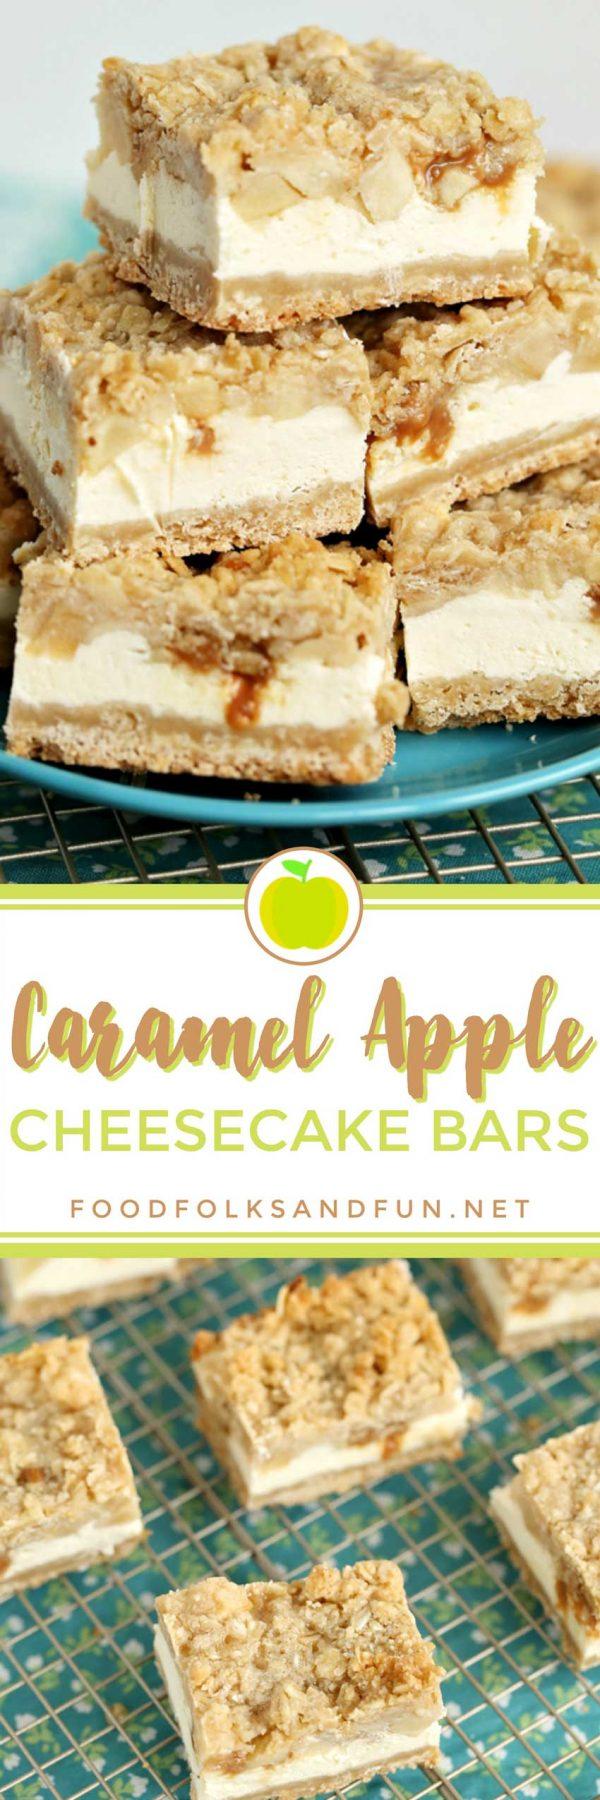 The best Caramel Apple Cheesecake Bars